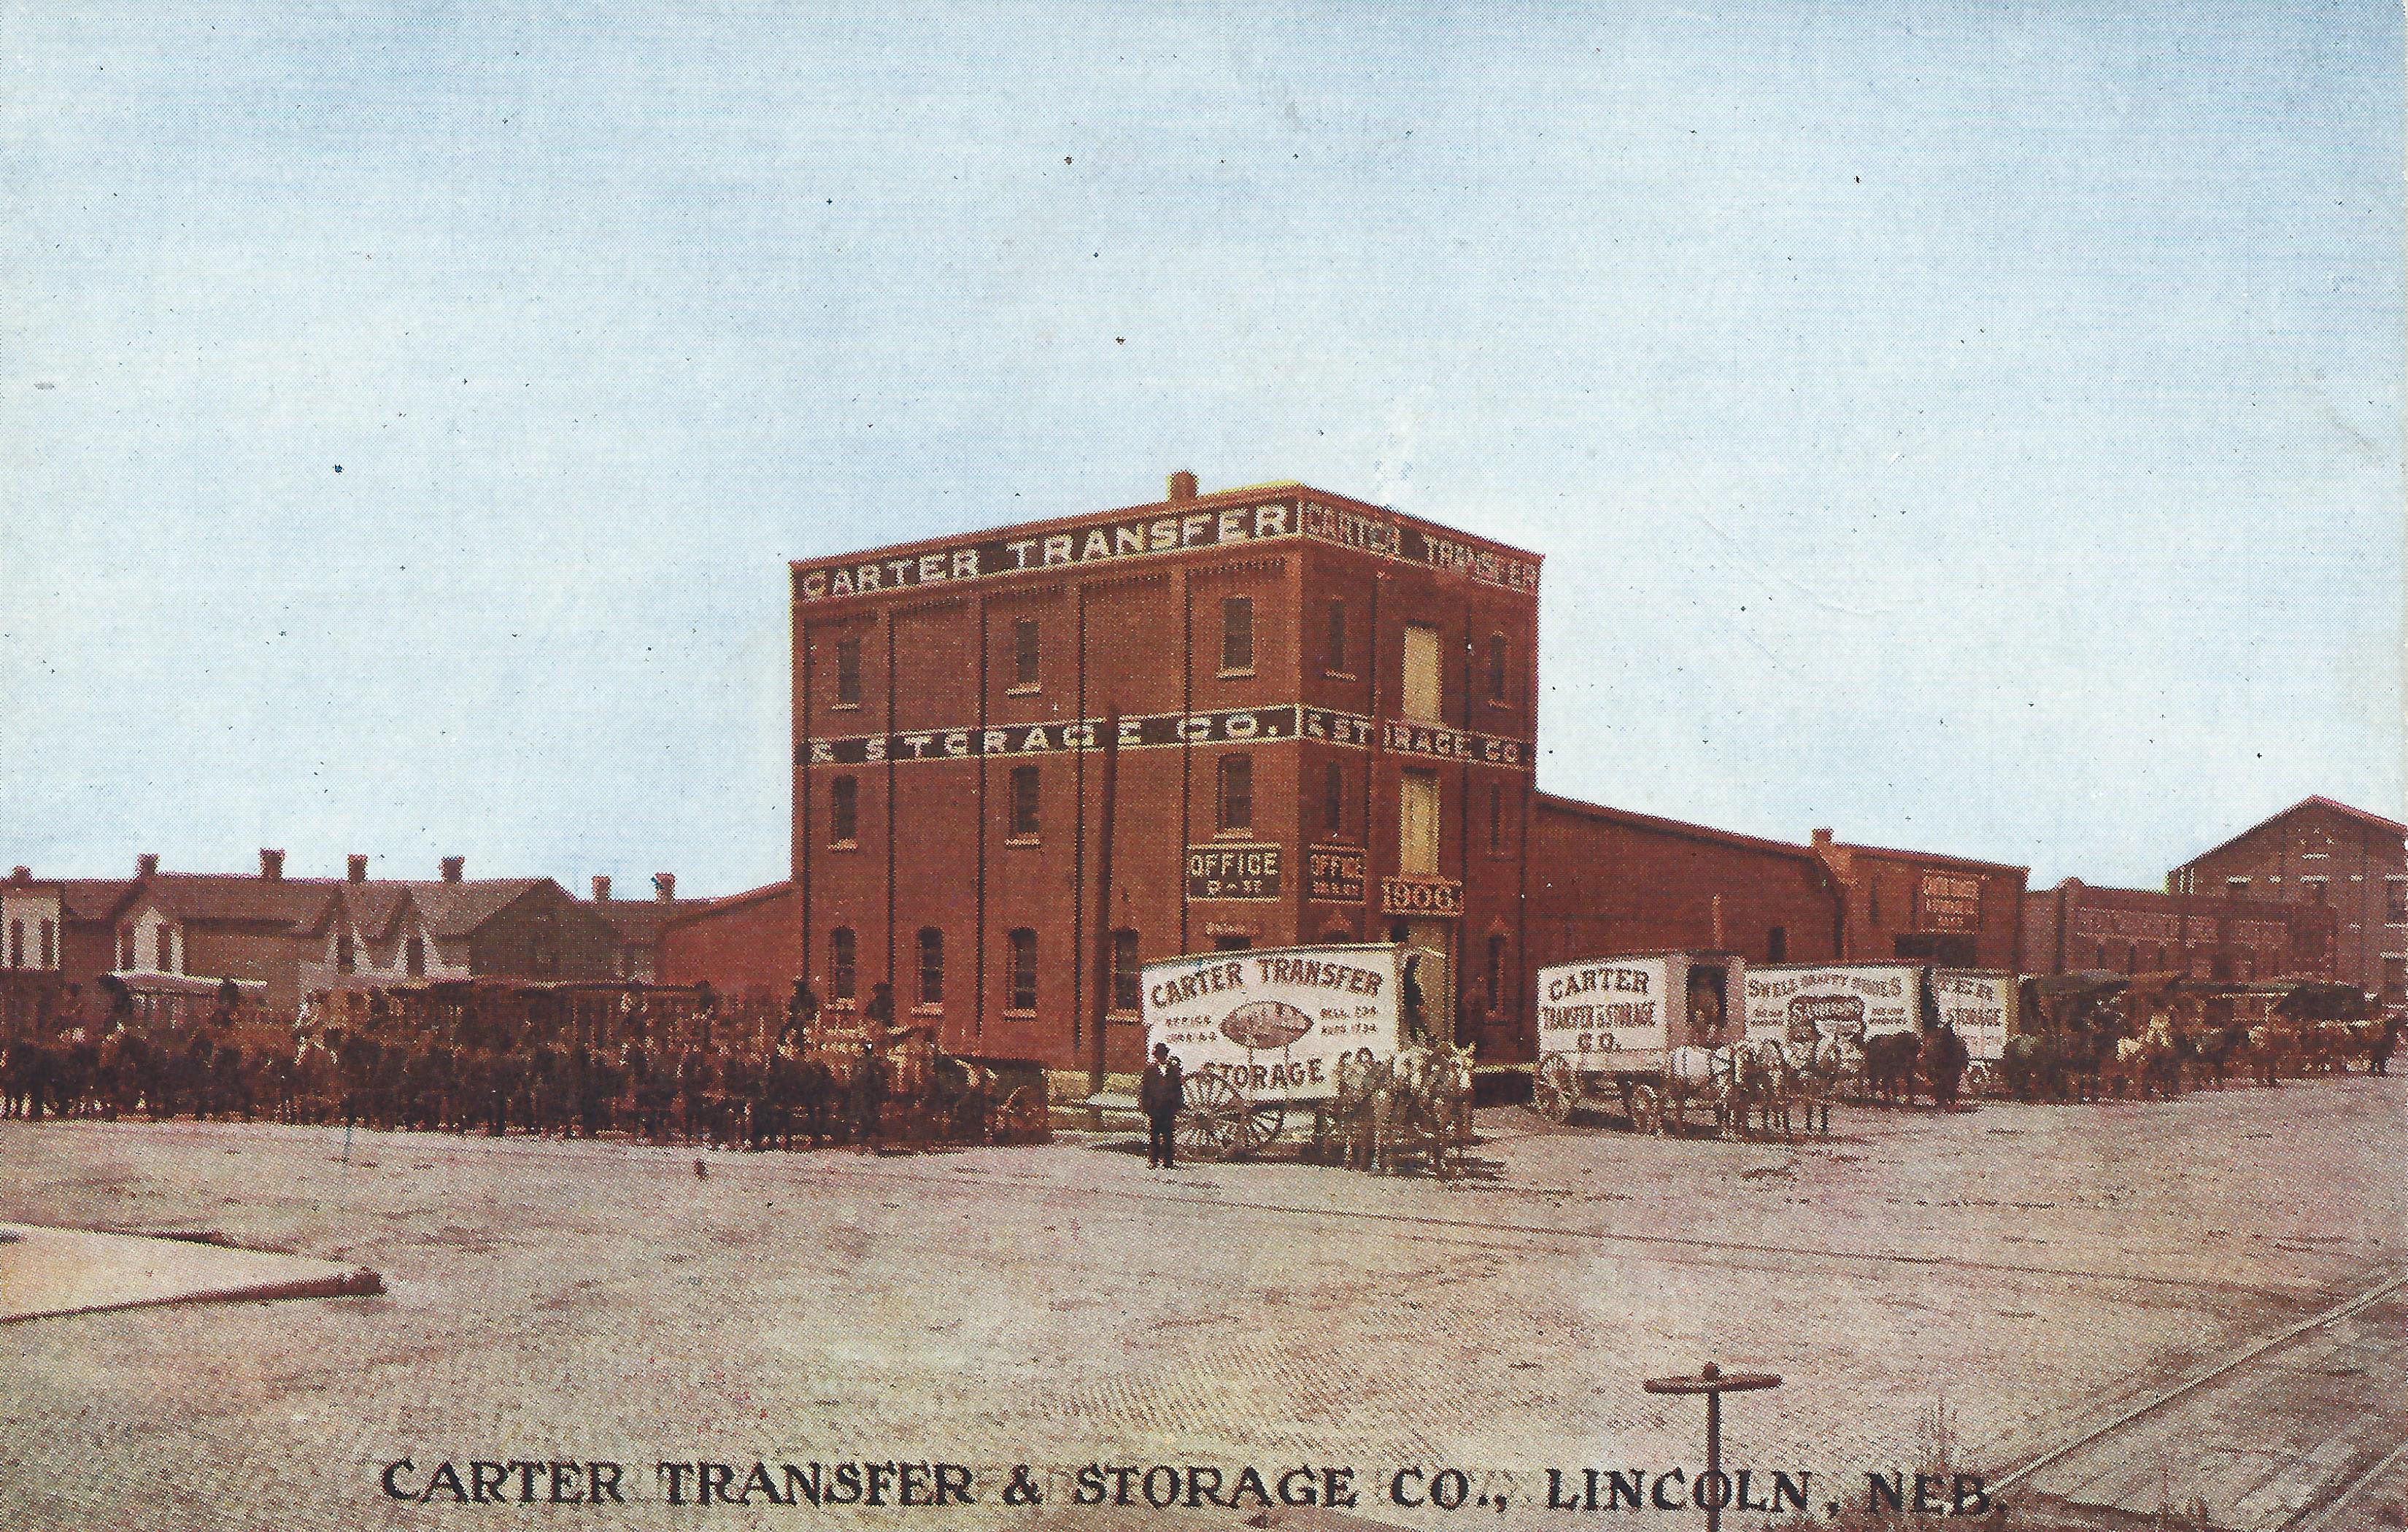 13. Seaton & Lea Ironworks Building